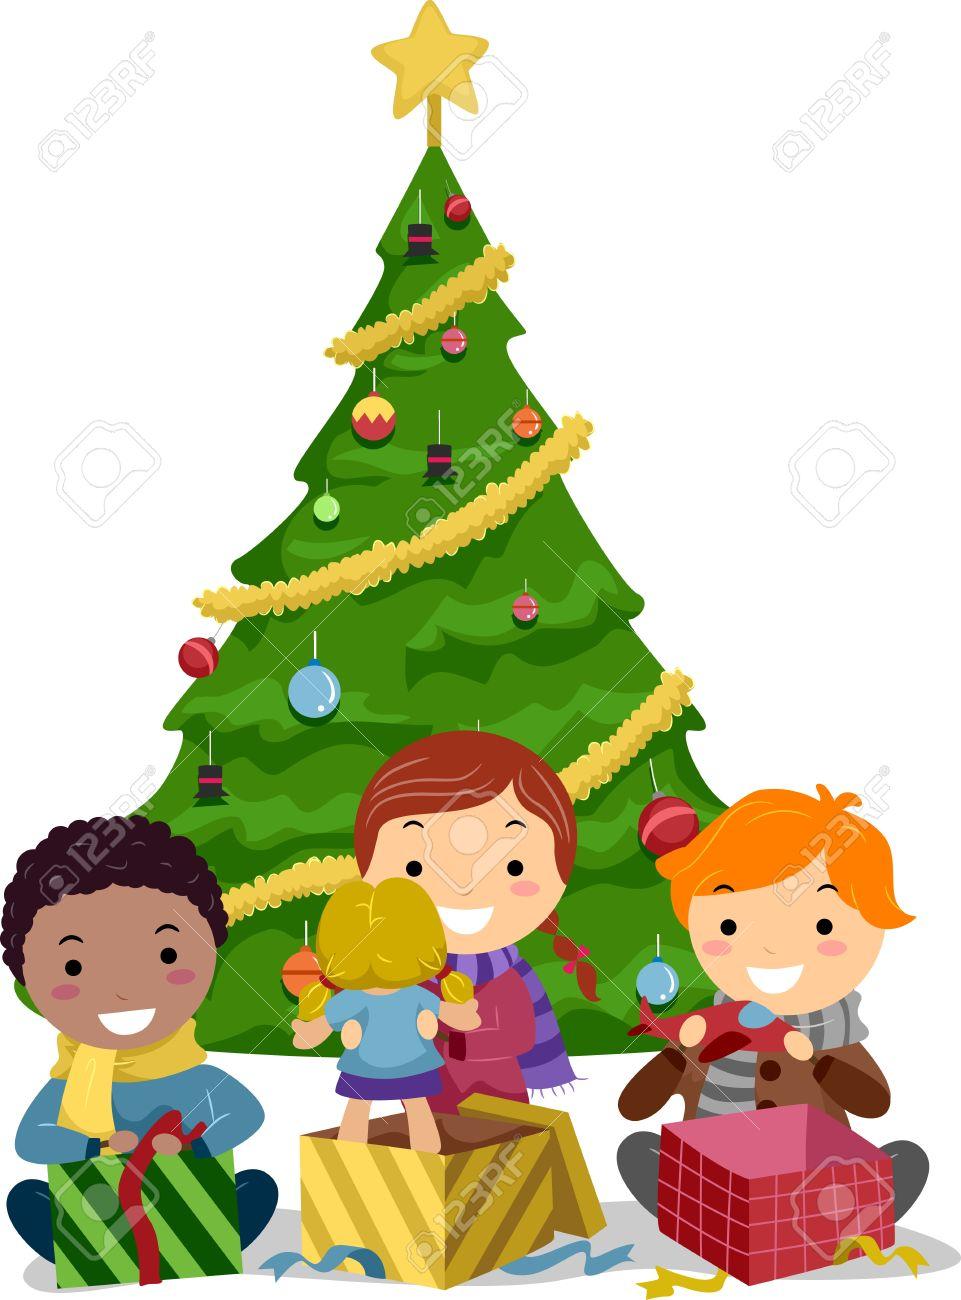 Image result for cartoon kids christmas tree